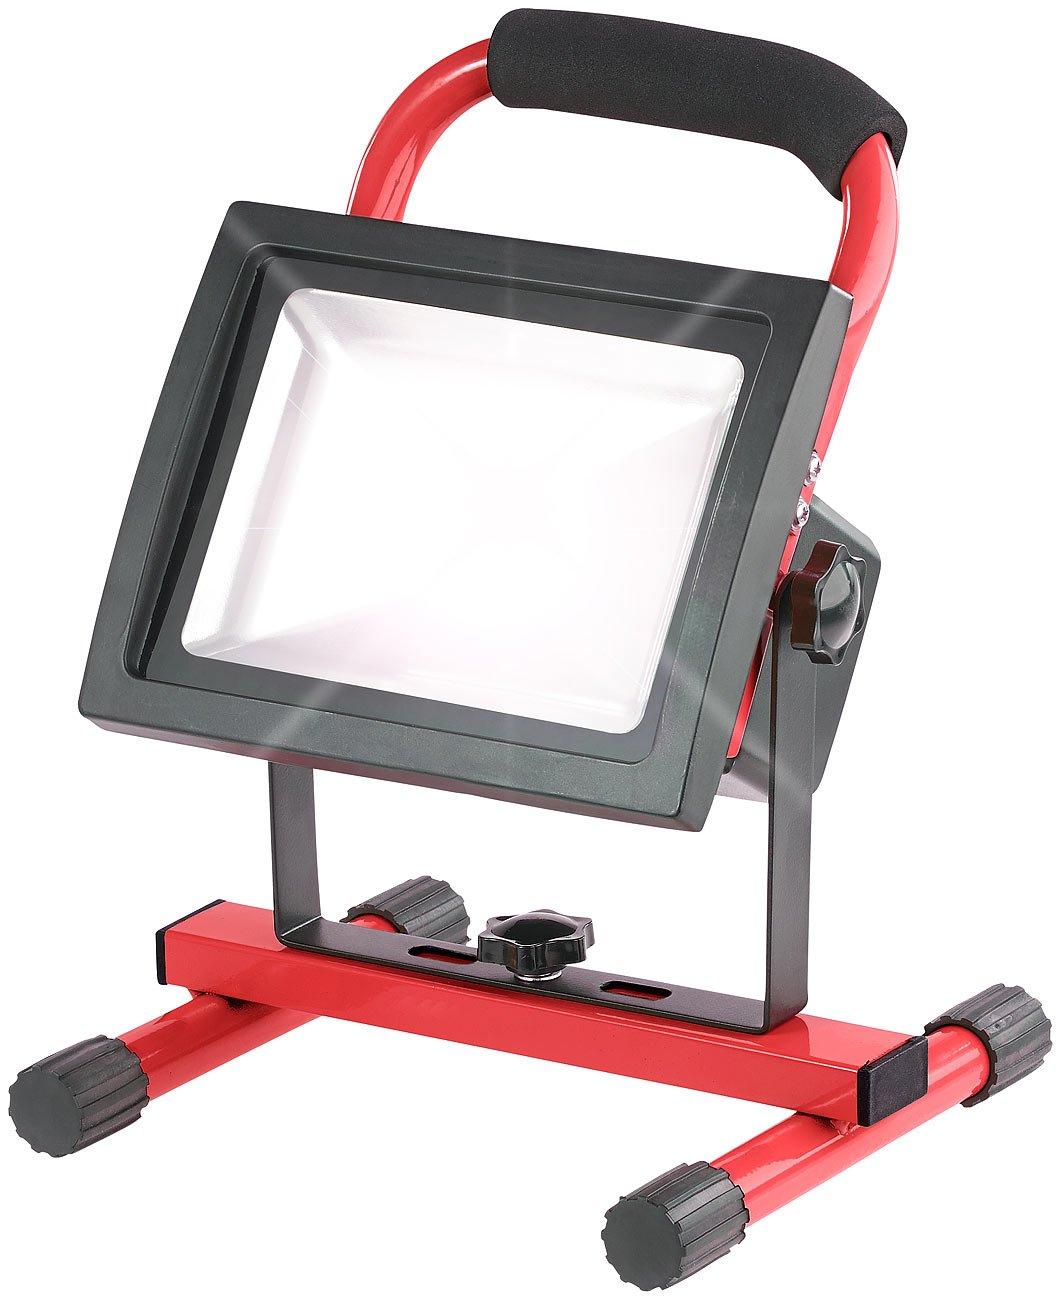 Luminea LED Strahler Akku: Wetterfester LED-Akku-Baustrahler mit Stand-Sockel, 20 W, 720 lm, IP65 (Akku LED Handscheinwerfer)